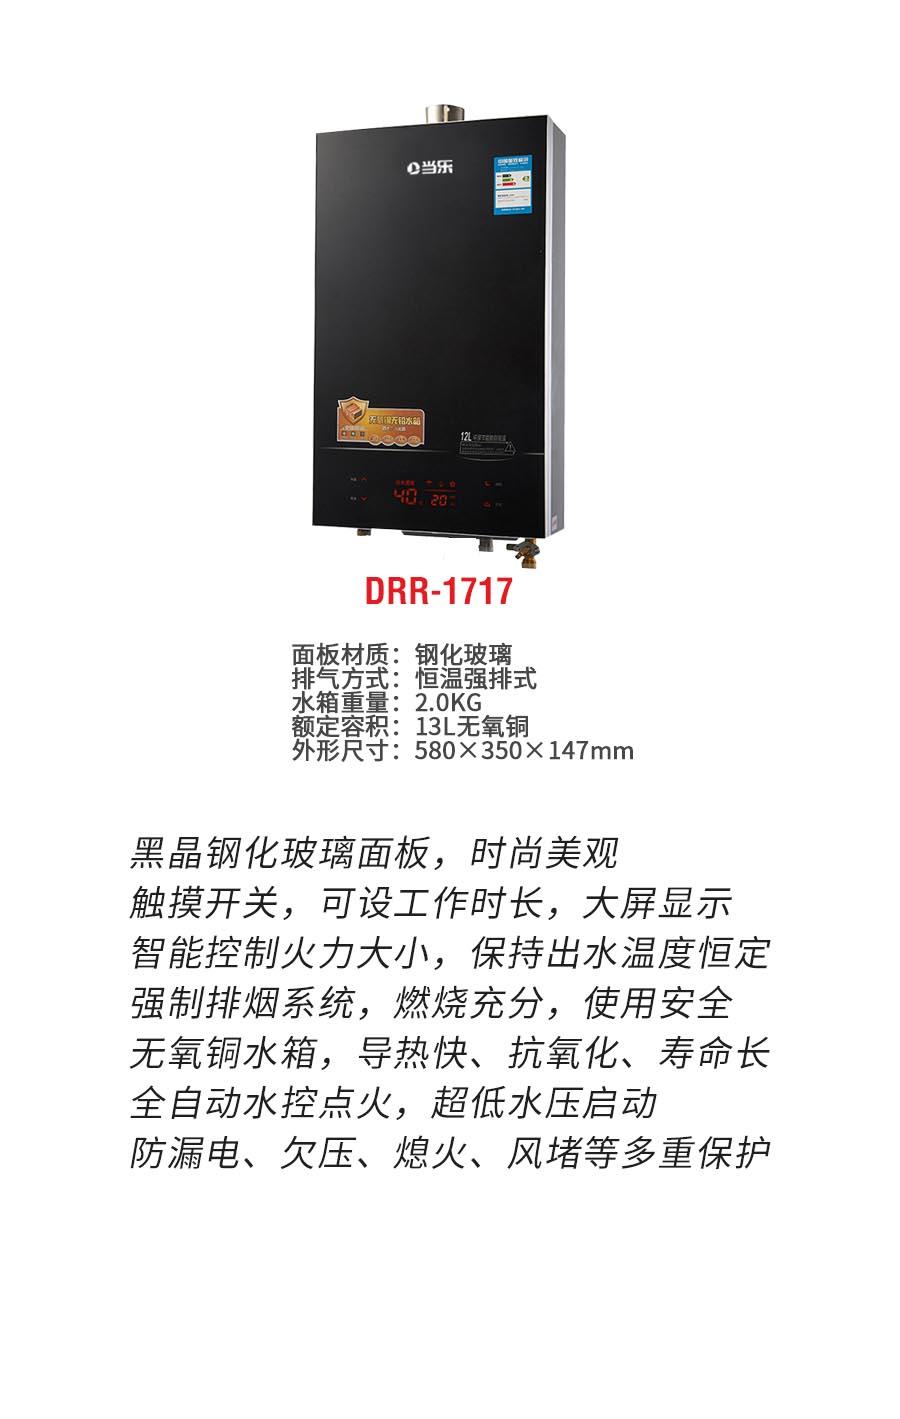 DRR-1717b.jpg